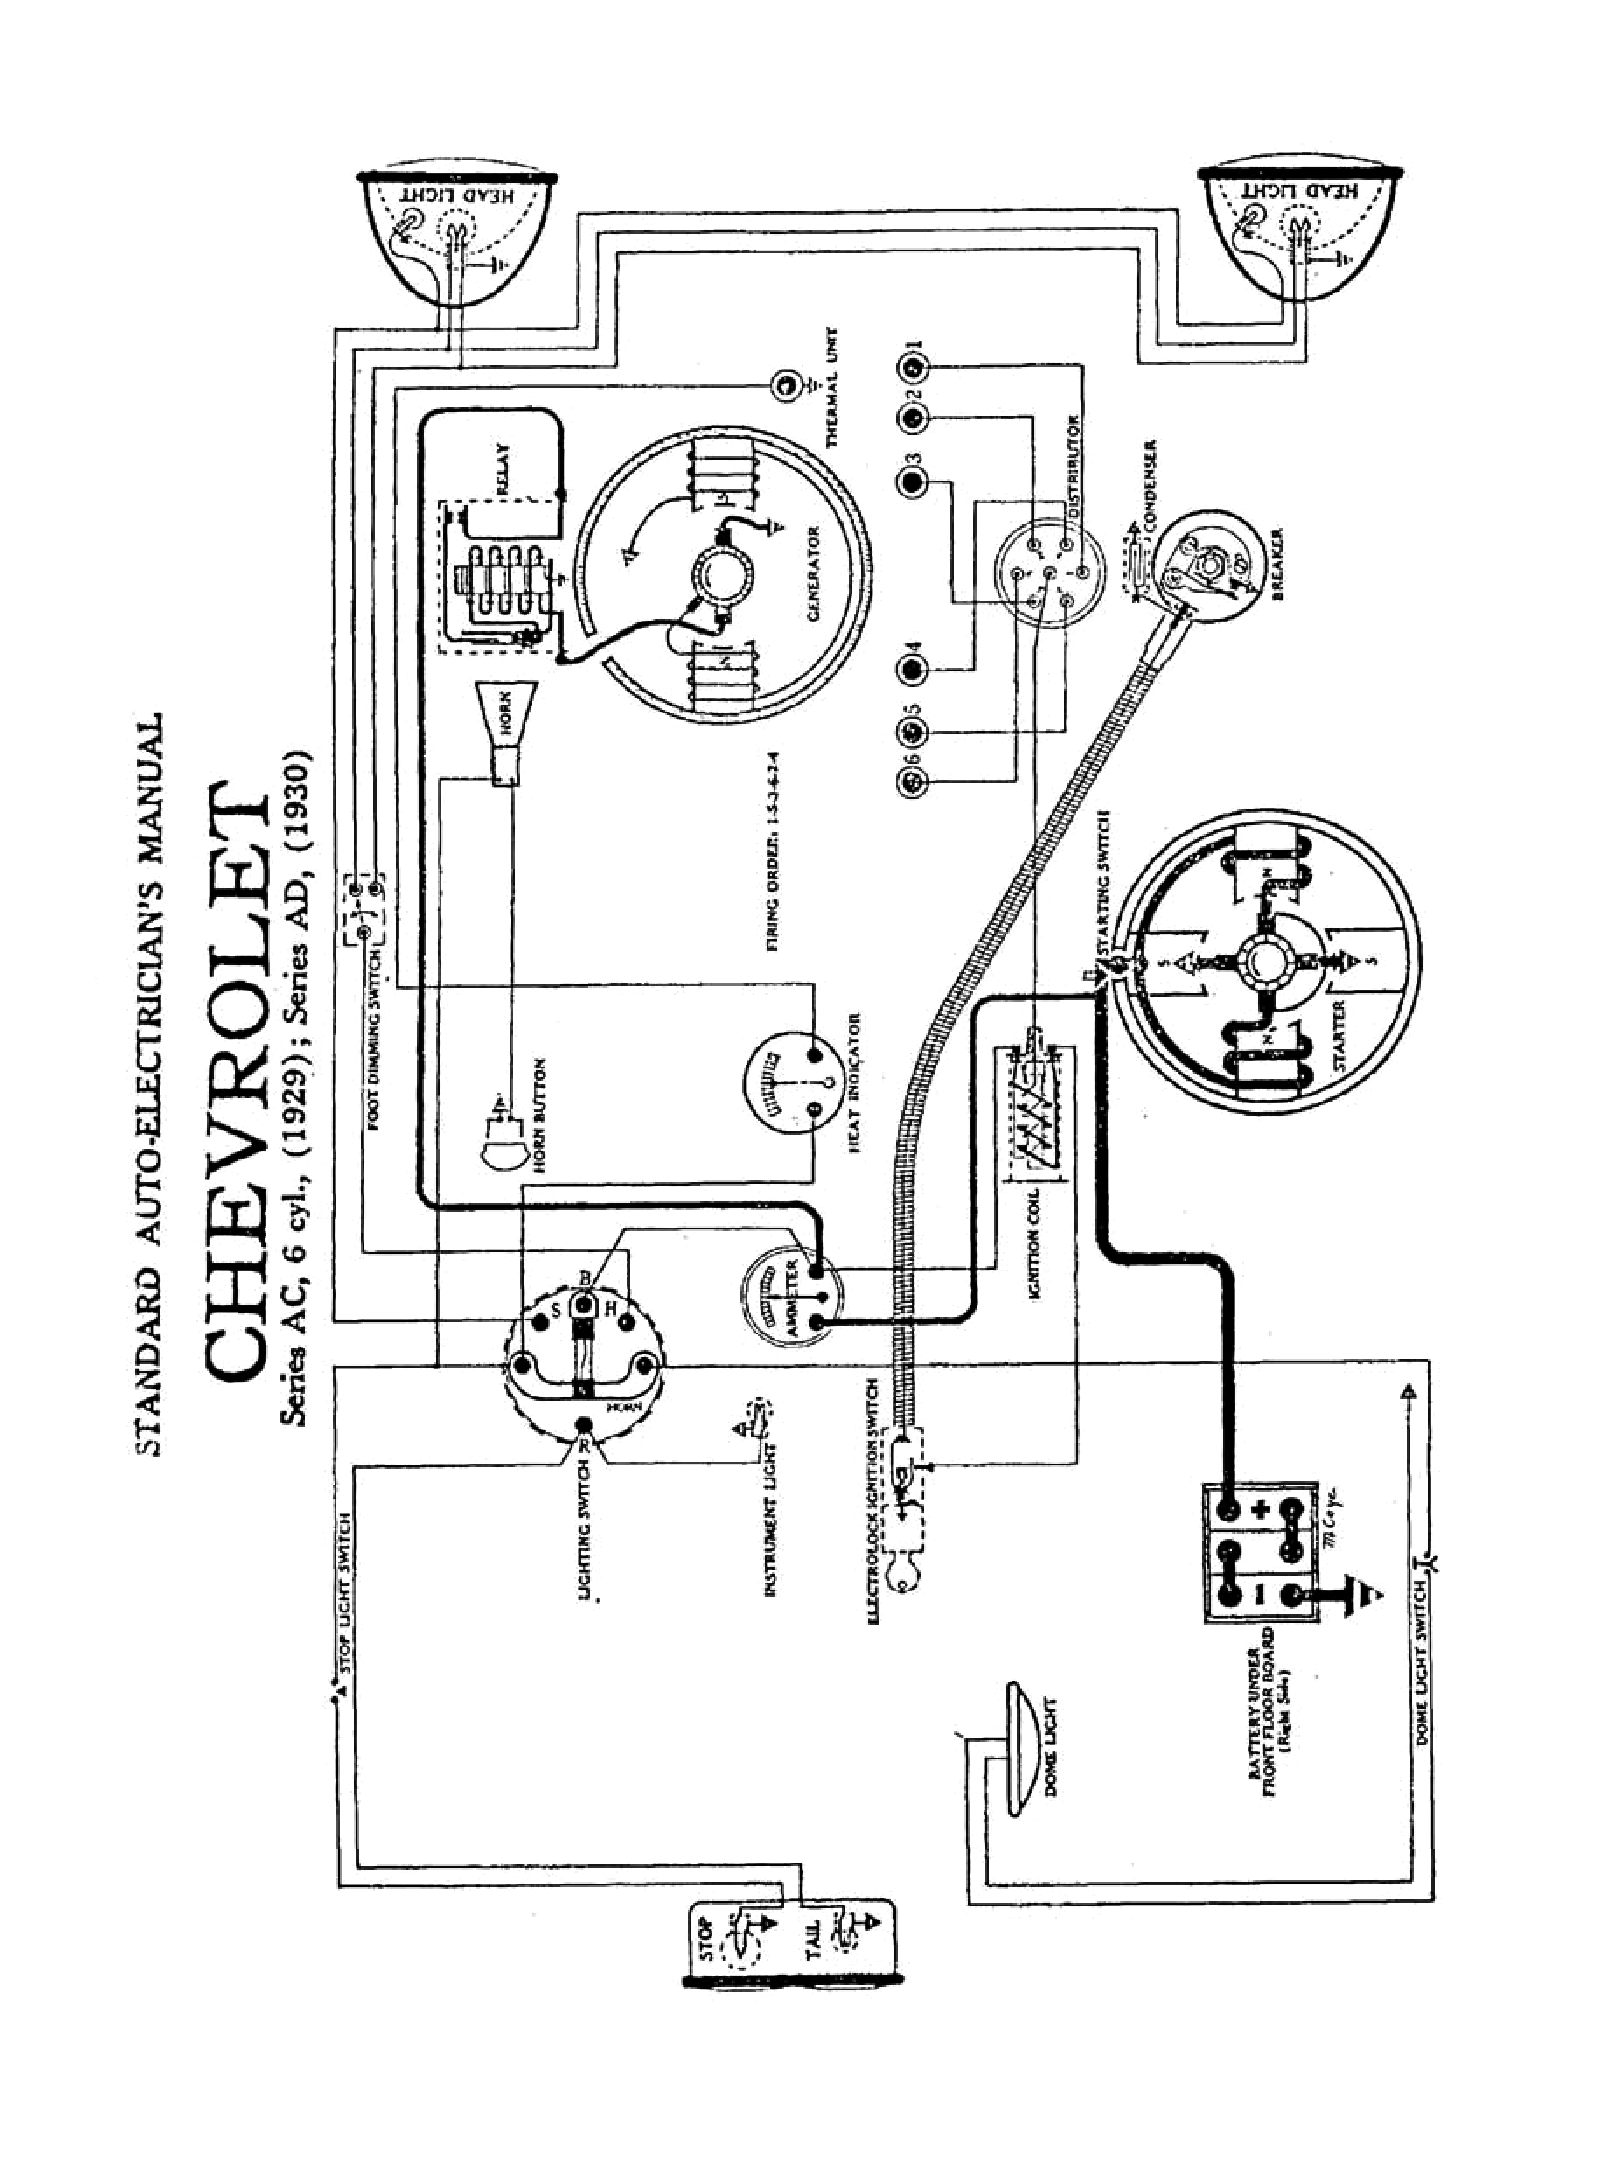 1950 Chevy Wiring Diagram Brakes Chevy Auto Wiring Diagram